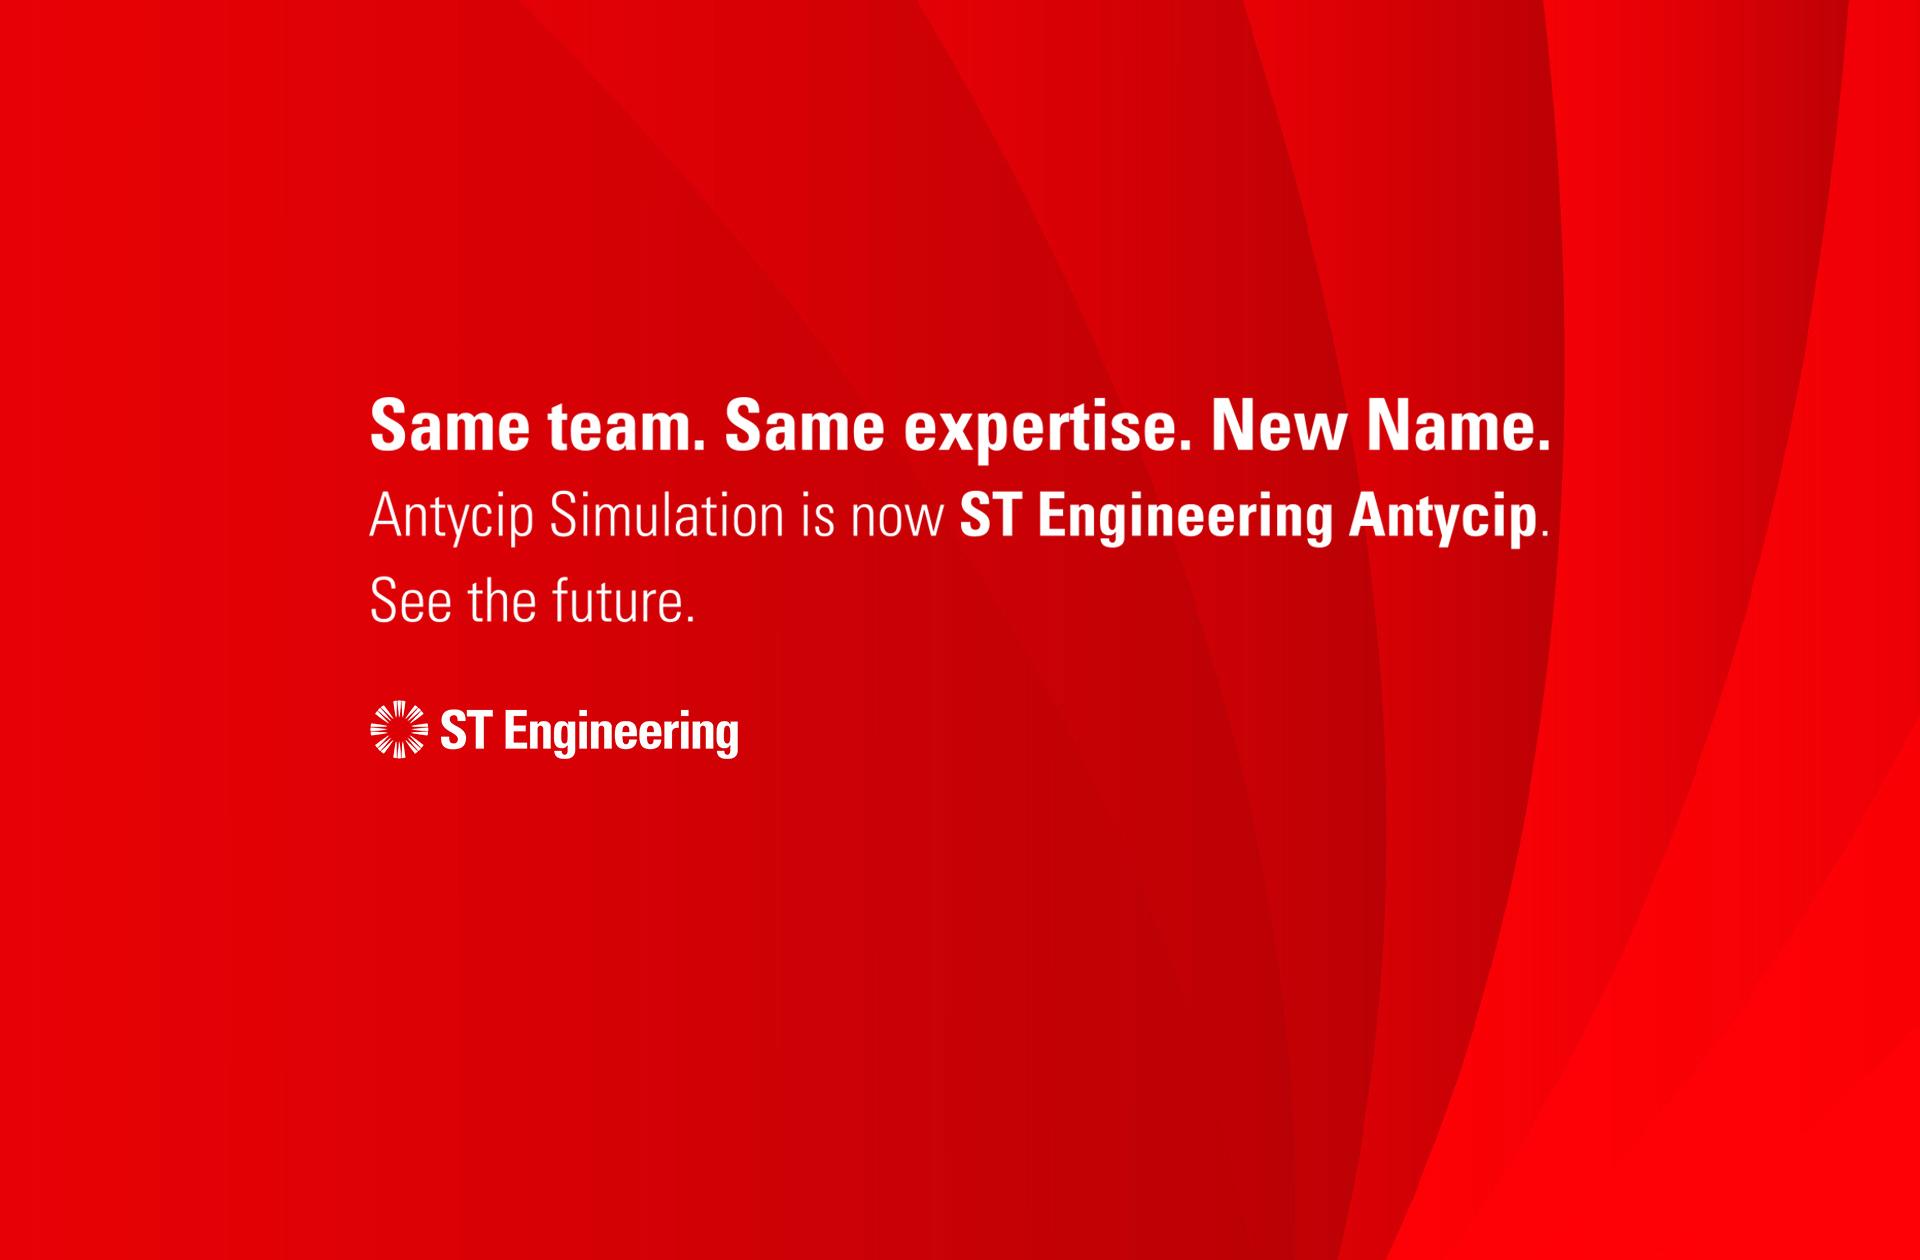 Antycip Simulation becomes ST Engineering Antycip